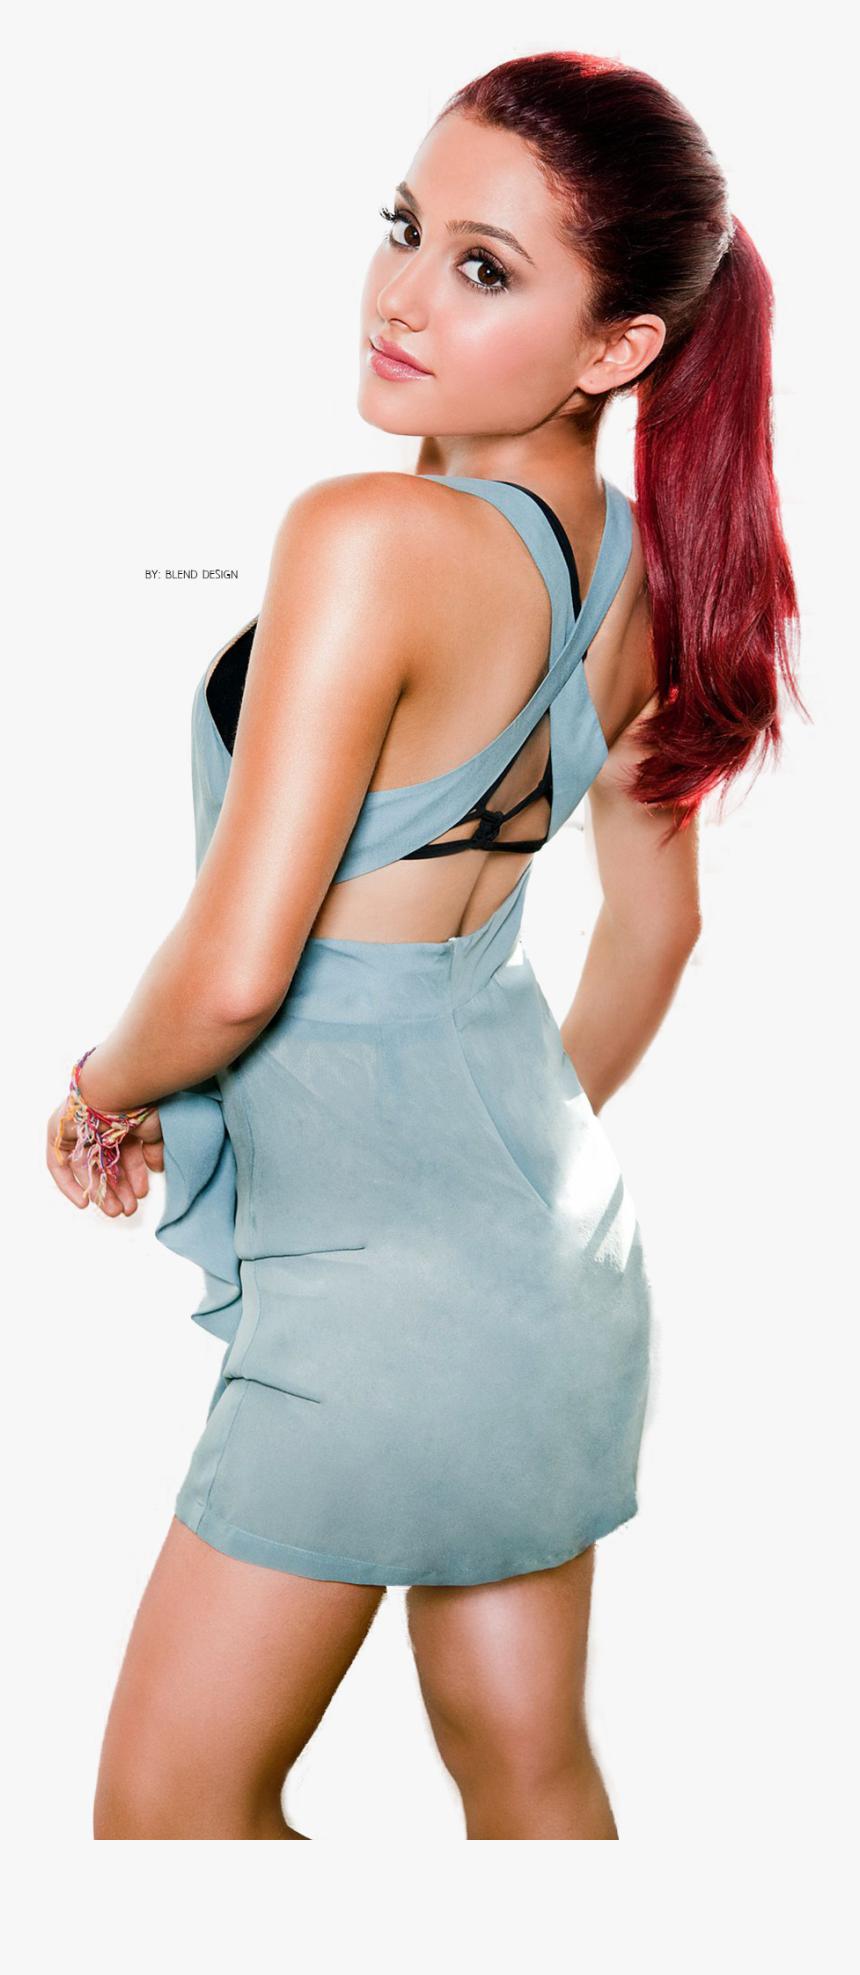 Ariana grande im bikini